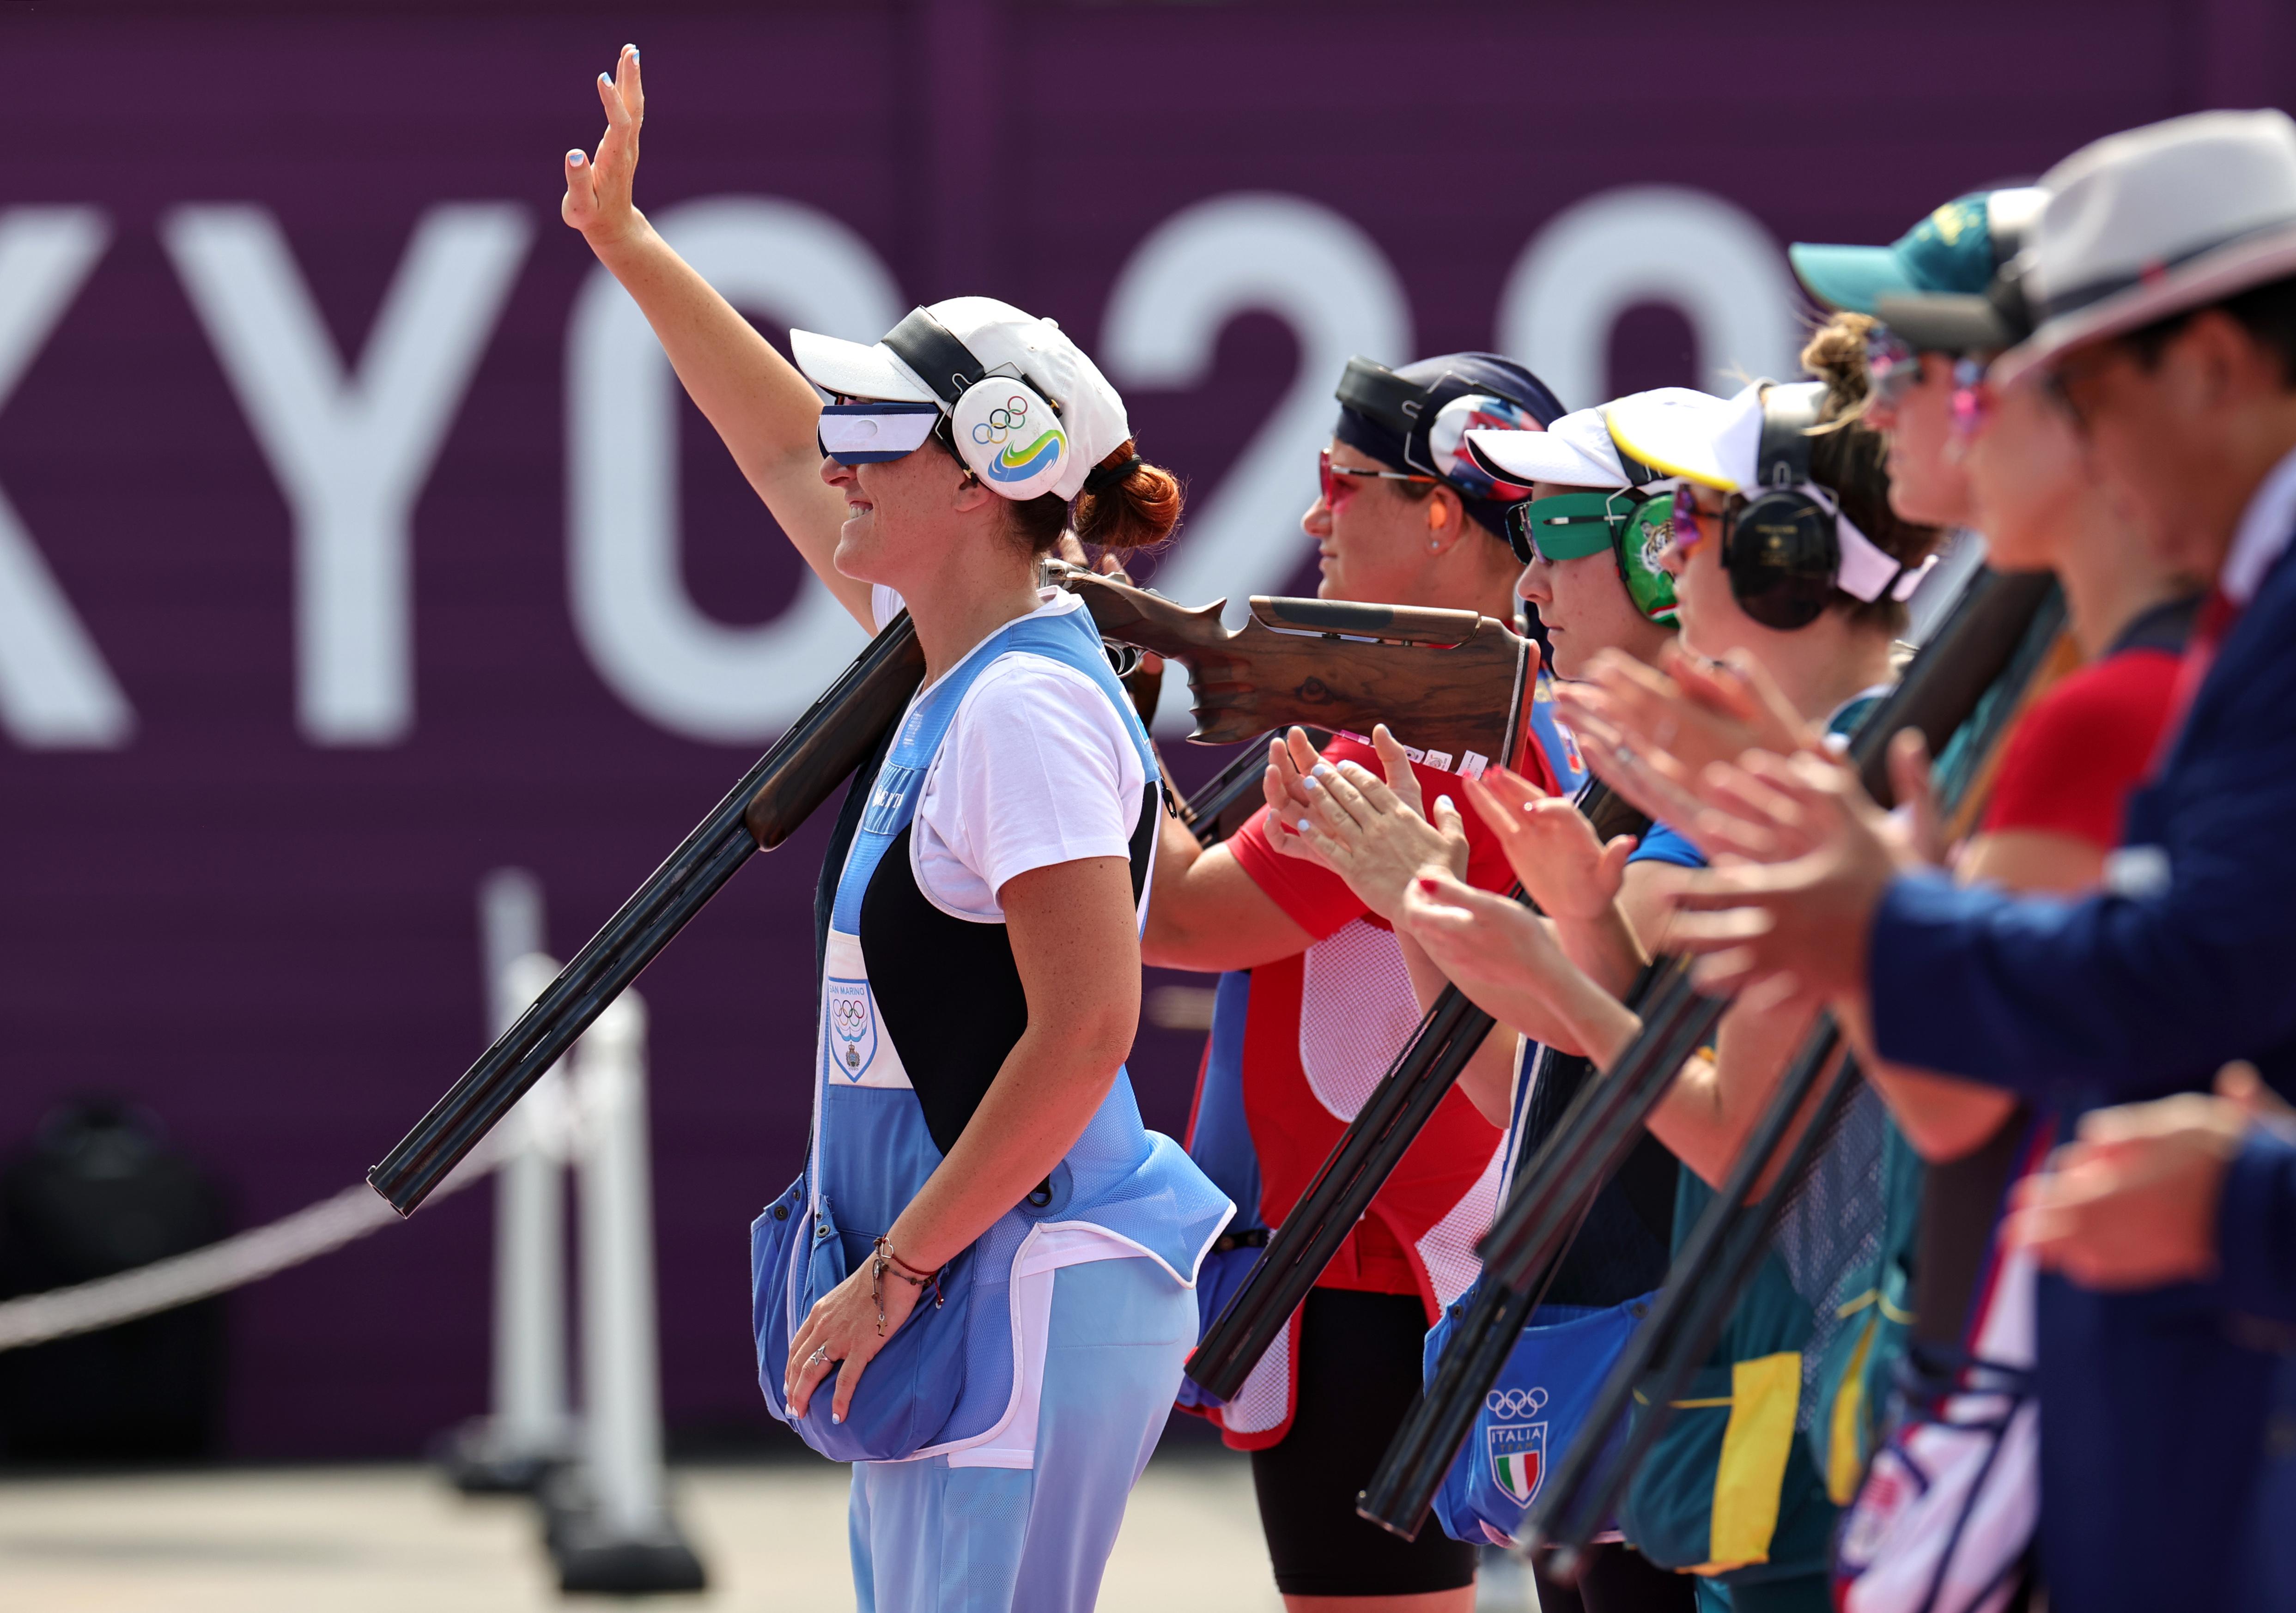 Tokyo 2020 Olympics - Shooting - Women's Trap - Final - Asaka Shooting Range, Tokyo, Japan - July 29, 2021. Alessandra Perilli of San Marino REUTERS/Ann Wang